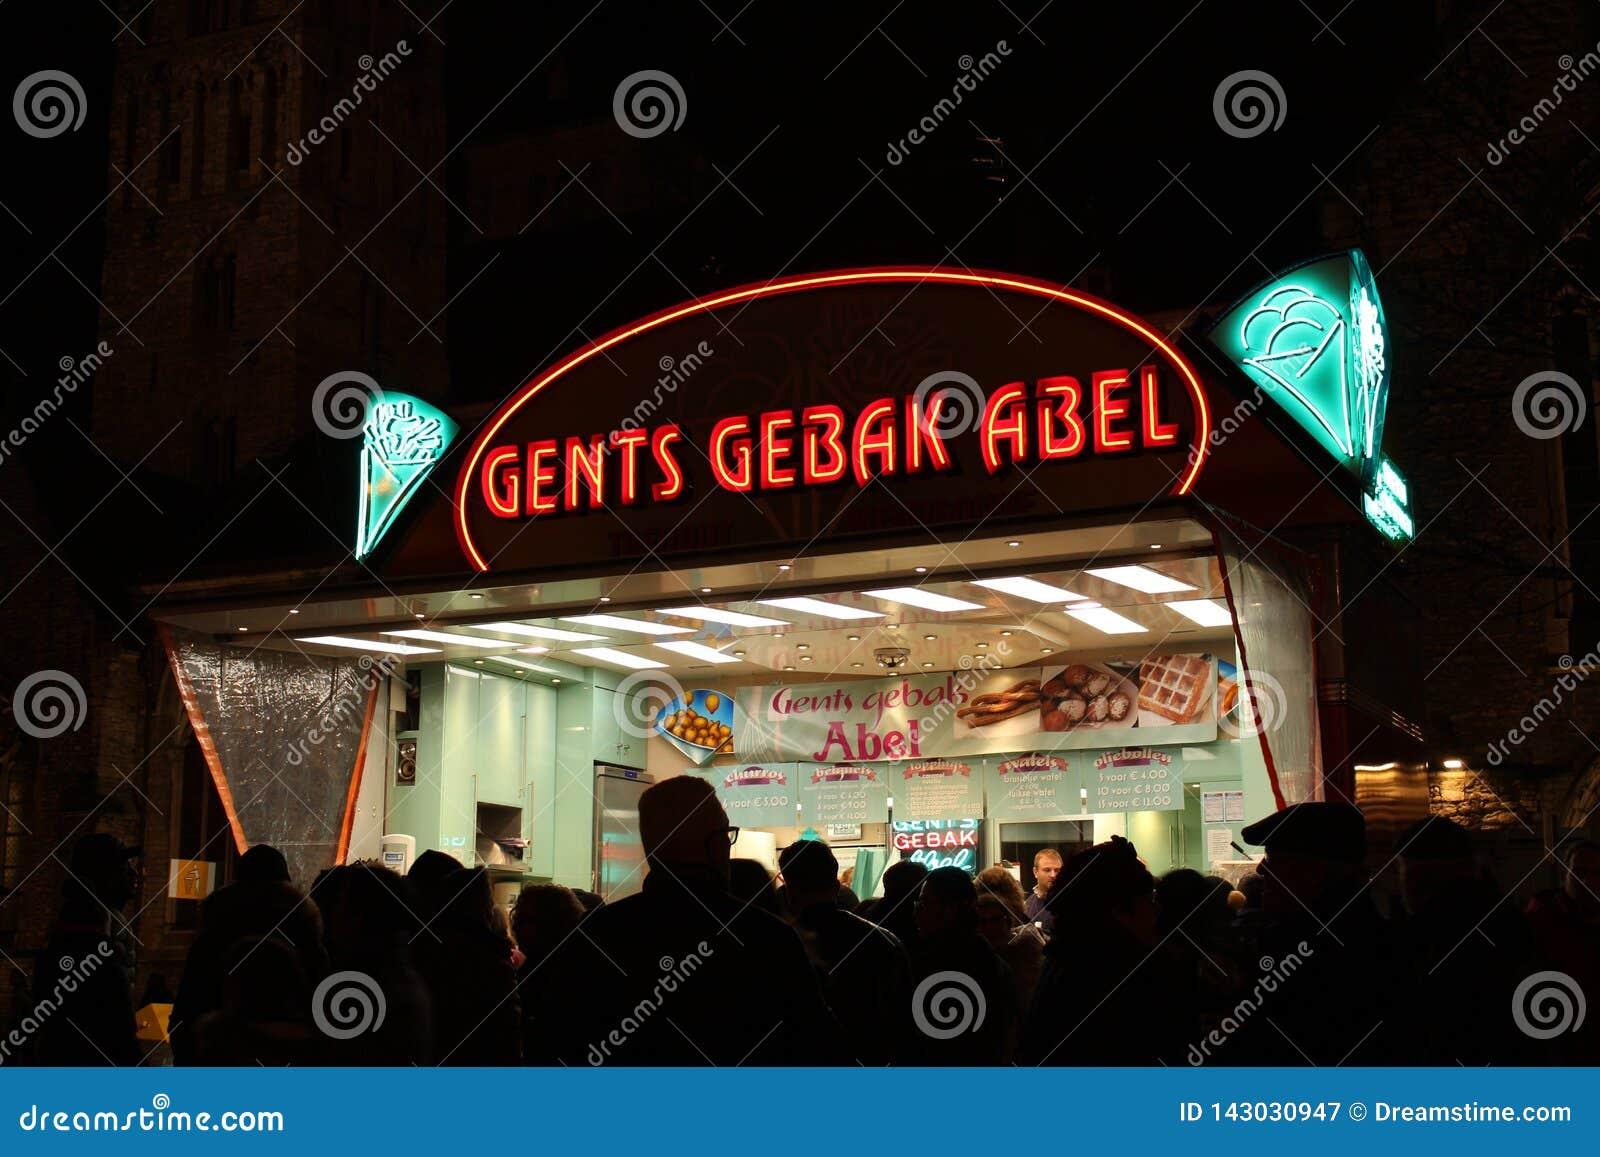 Gents Gebak Abel, Ghent Belgium, Light festival